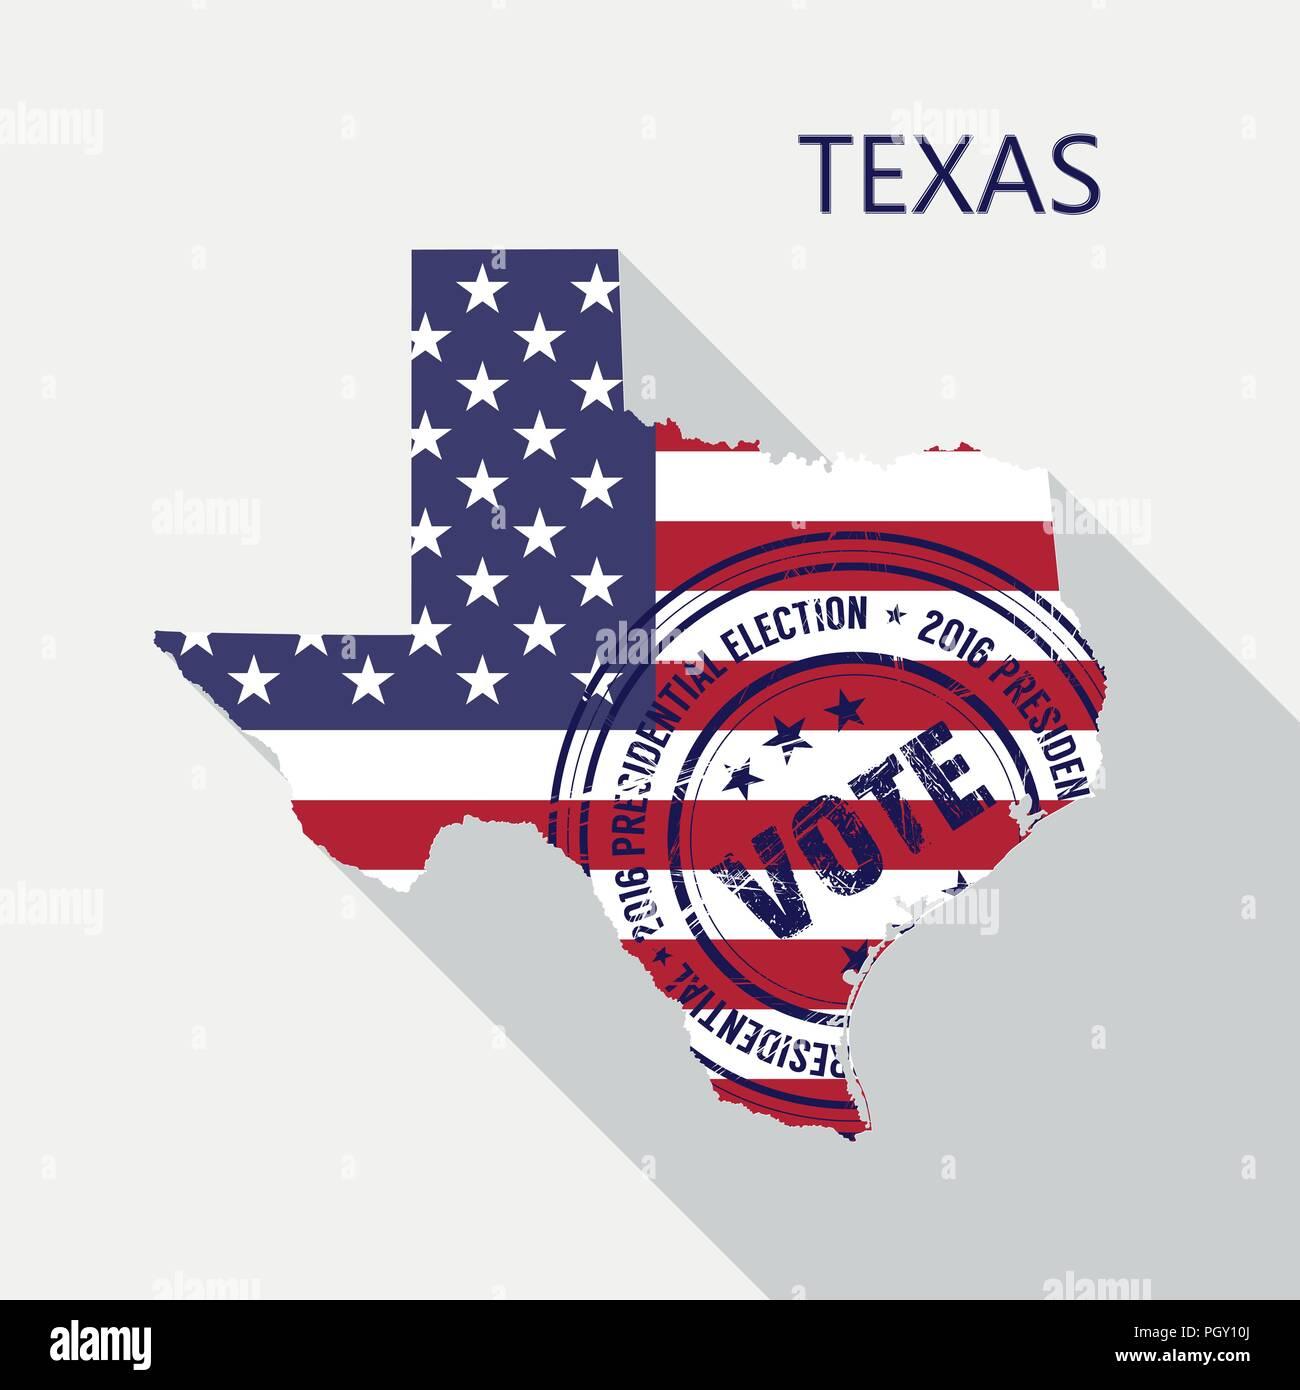 Old Map Texas Imágenes De Stock & Old Map Texas Fotos De Stock - Alamy